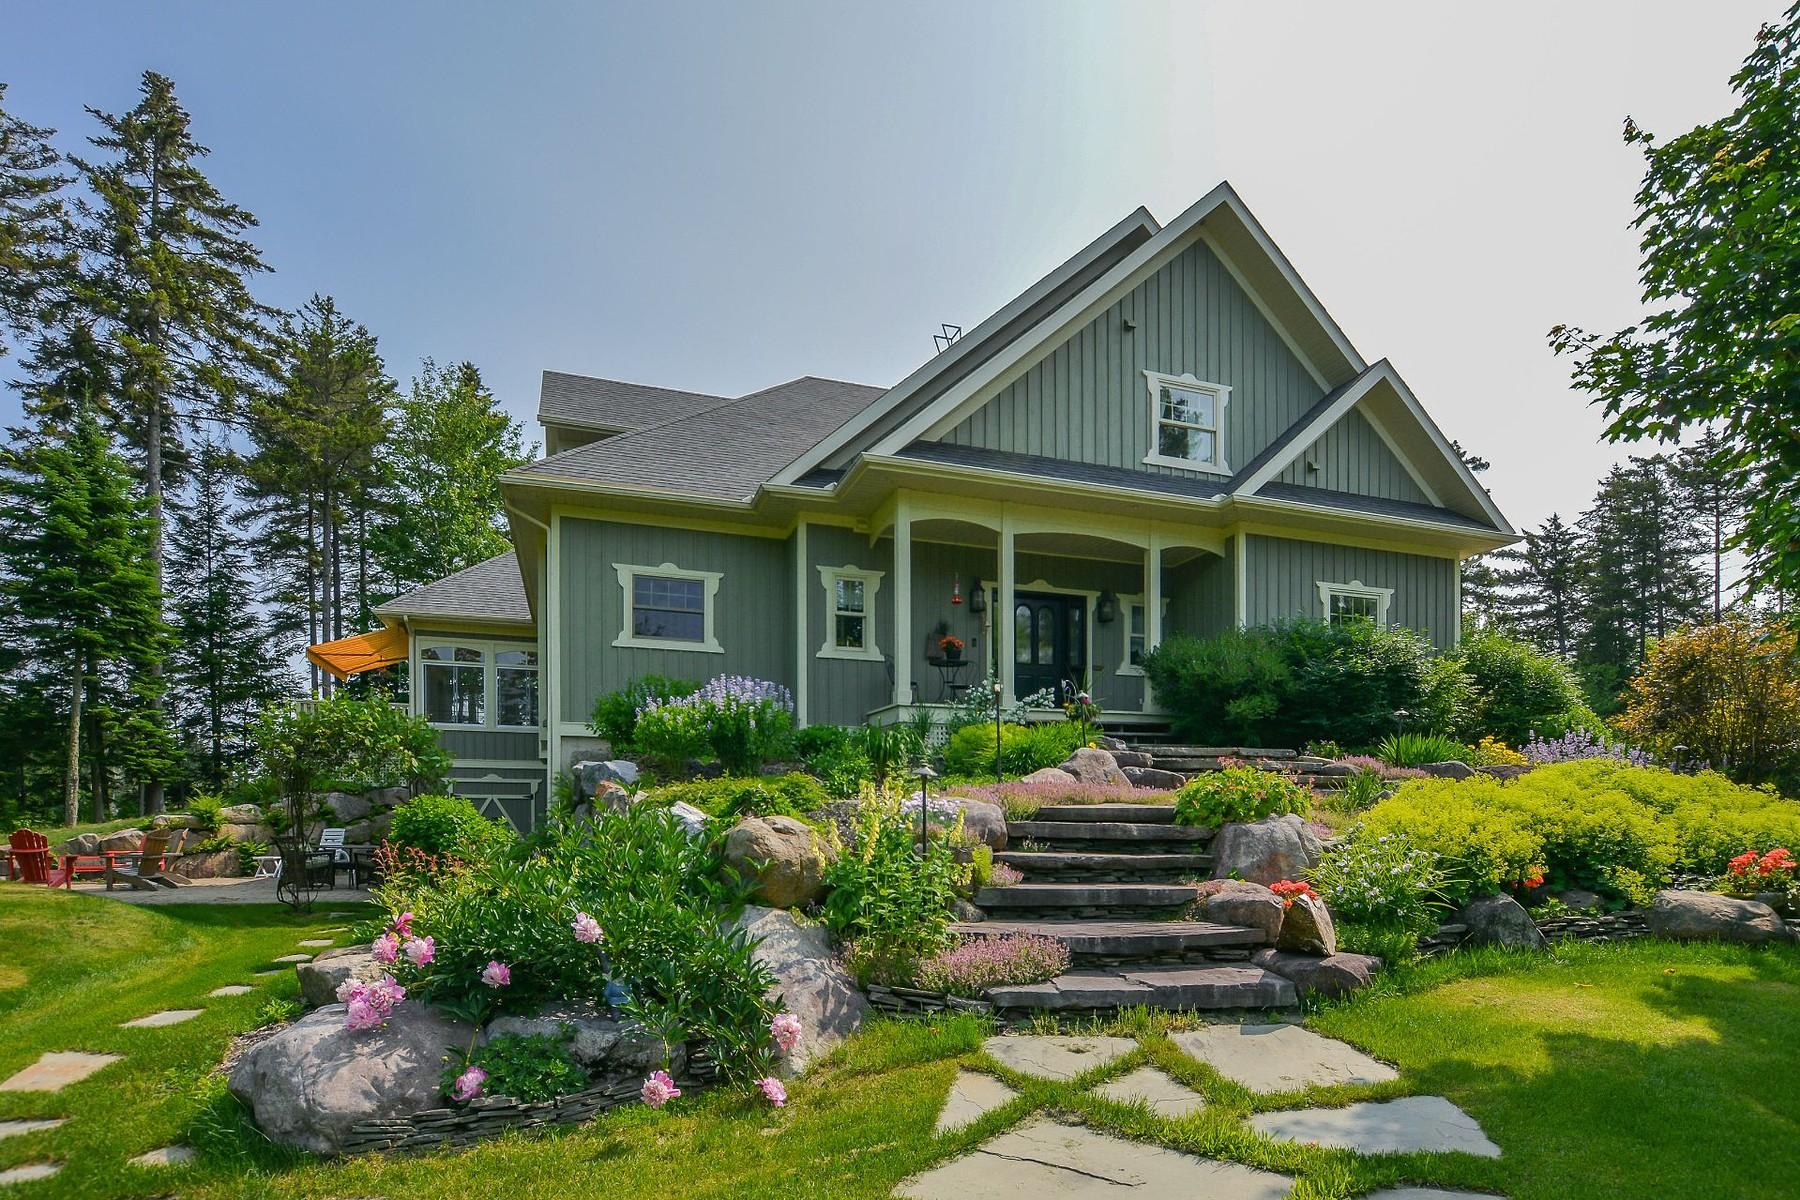 Single Family Homes for Sale at Saint-Adolphe-d'Howard, Laurentides 350 Ch. du Lac-Cornu Saint-Adolphe-D'howard, Quebec J0T2B0 Canada